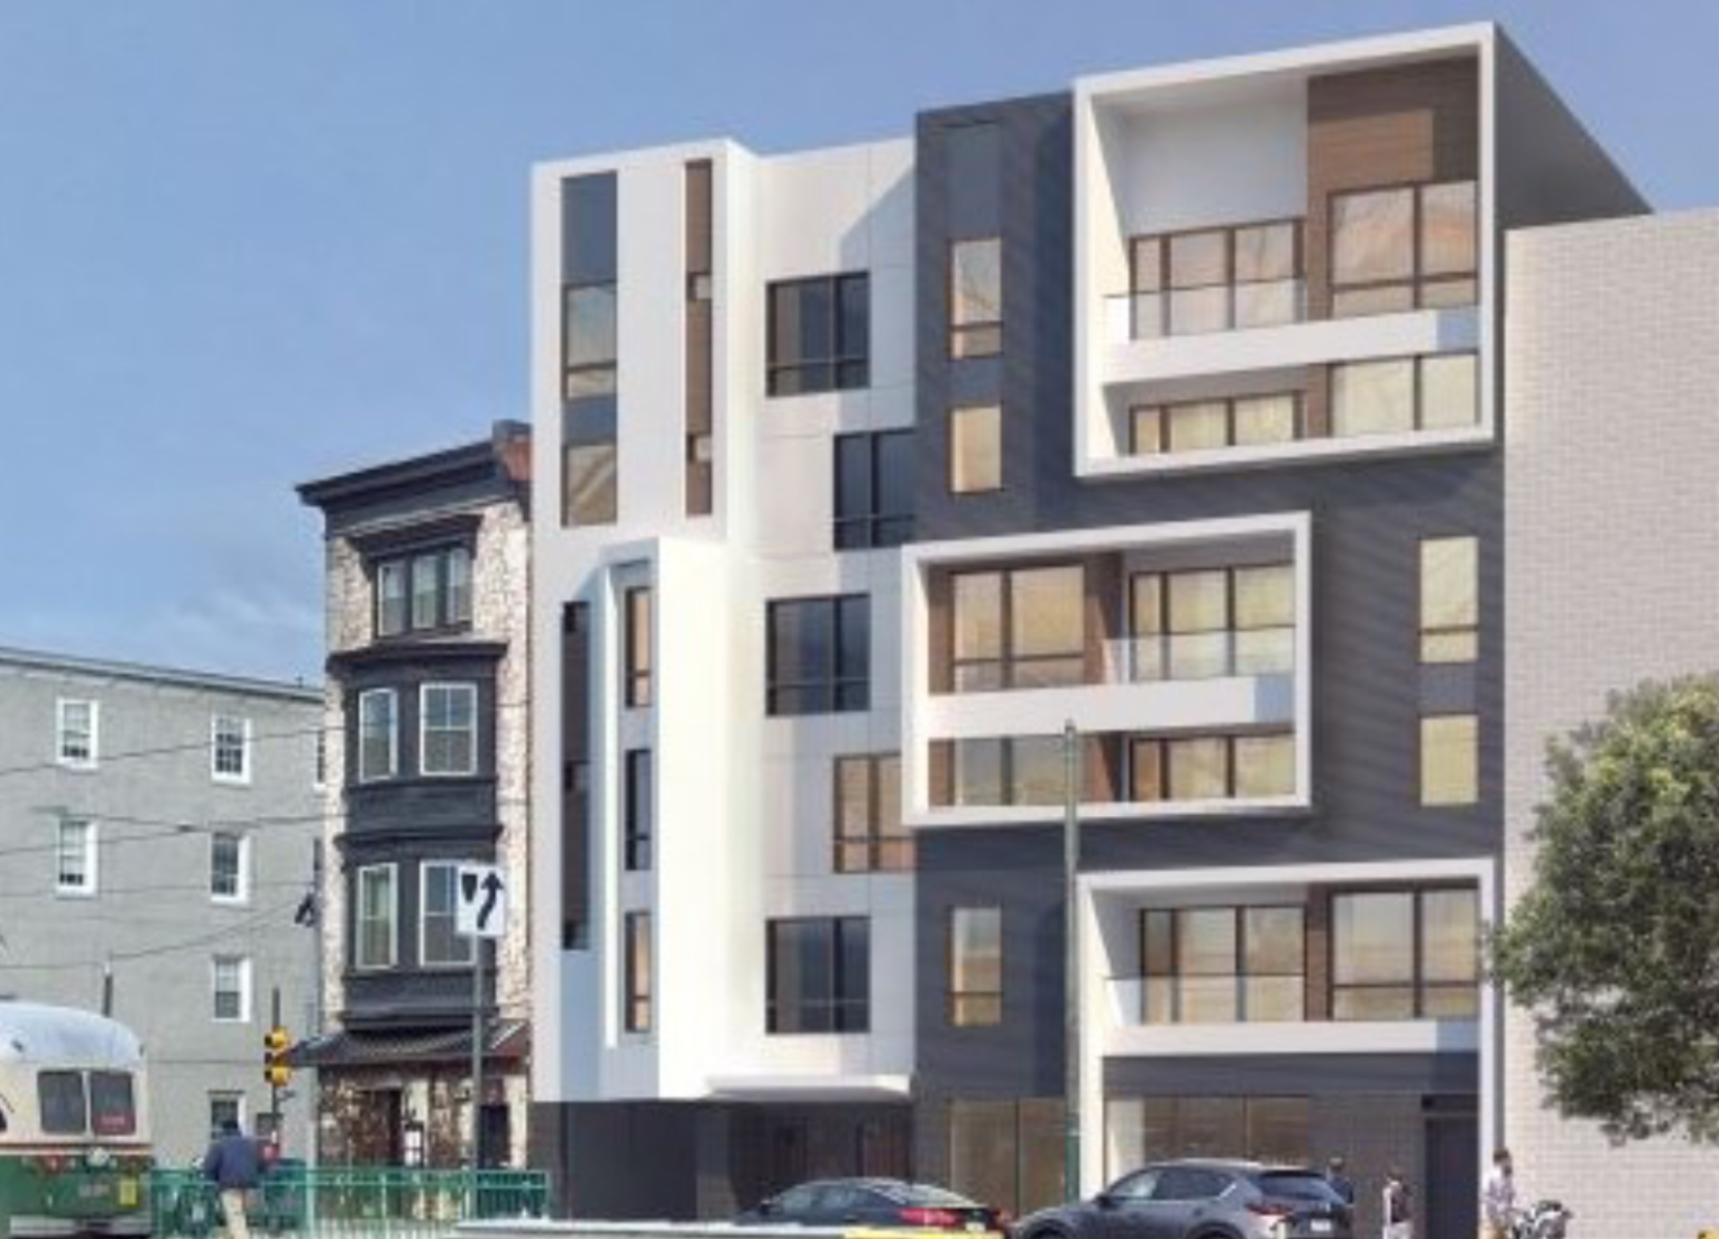 Rendering of 629 West Girard Avenue. Credit: RM Development.